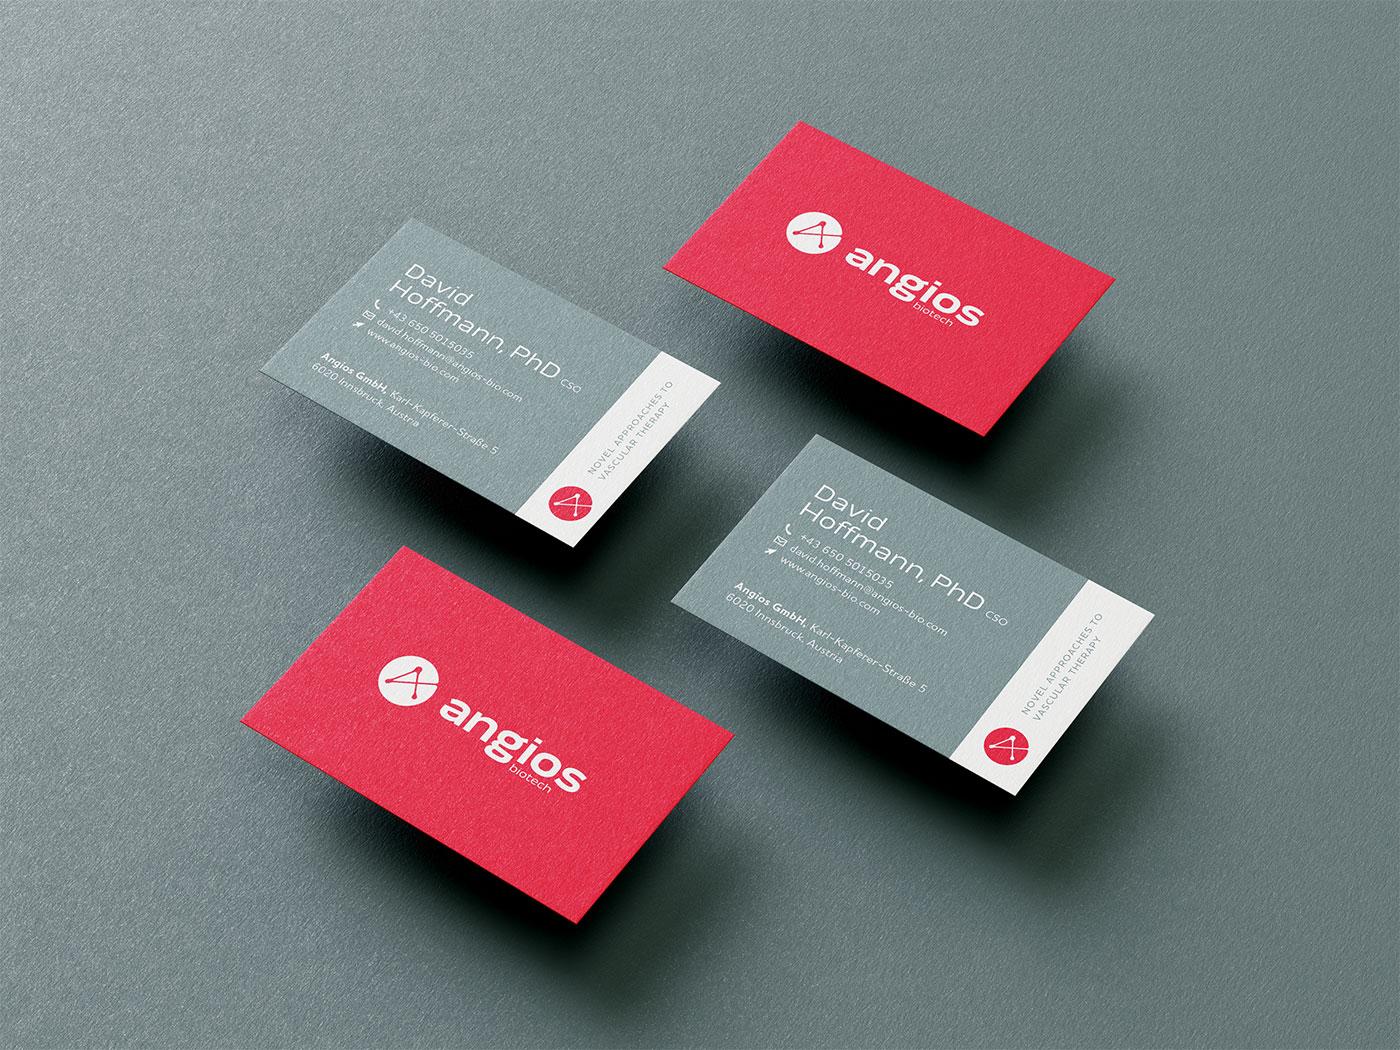 Angios biotech - Corporate Design